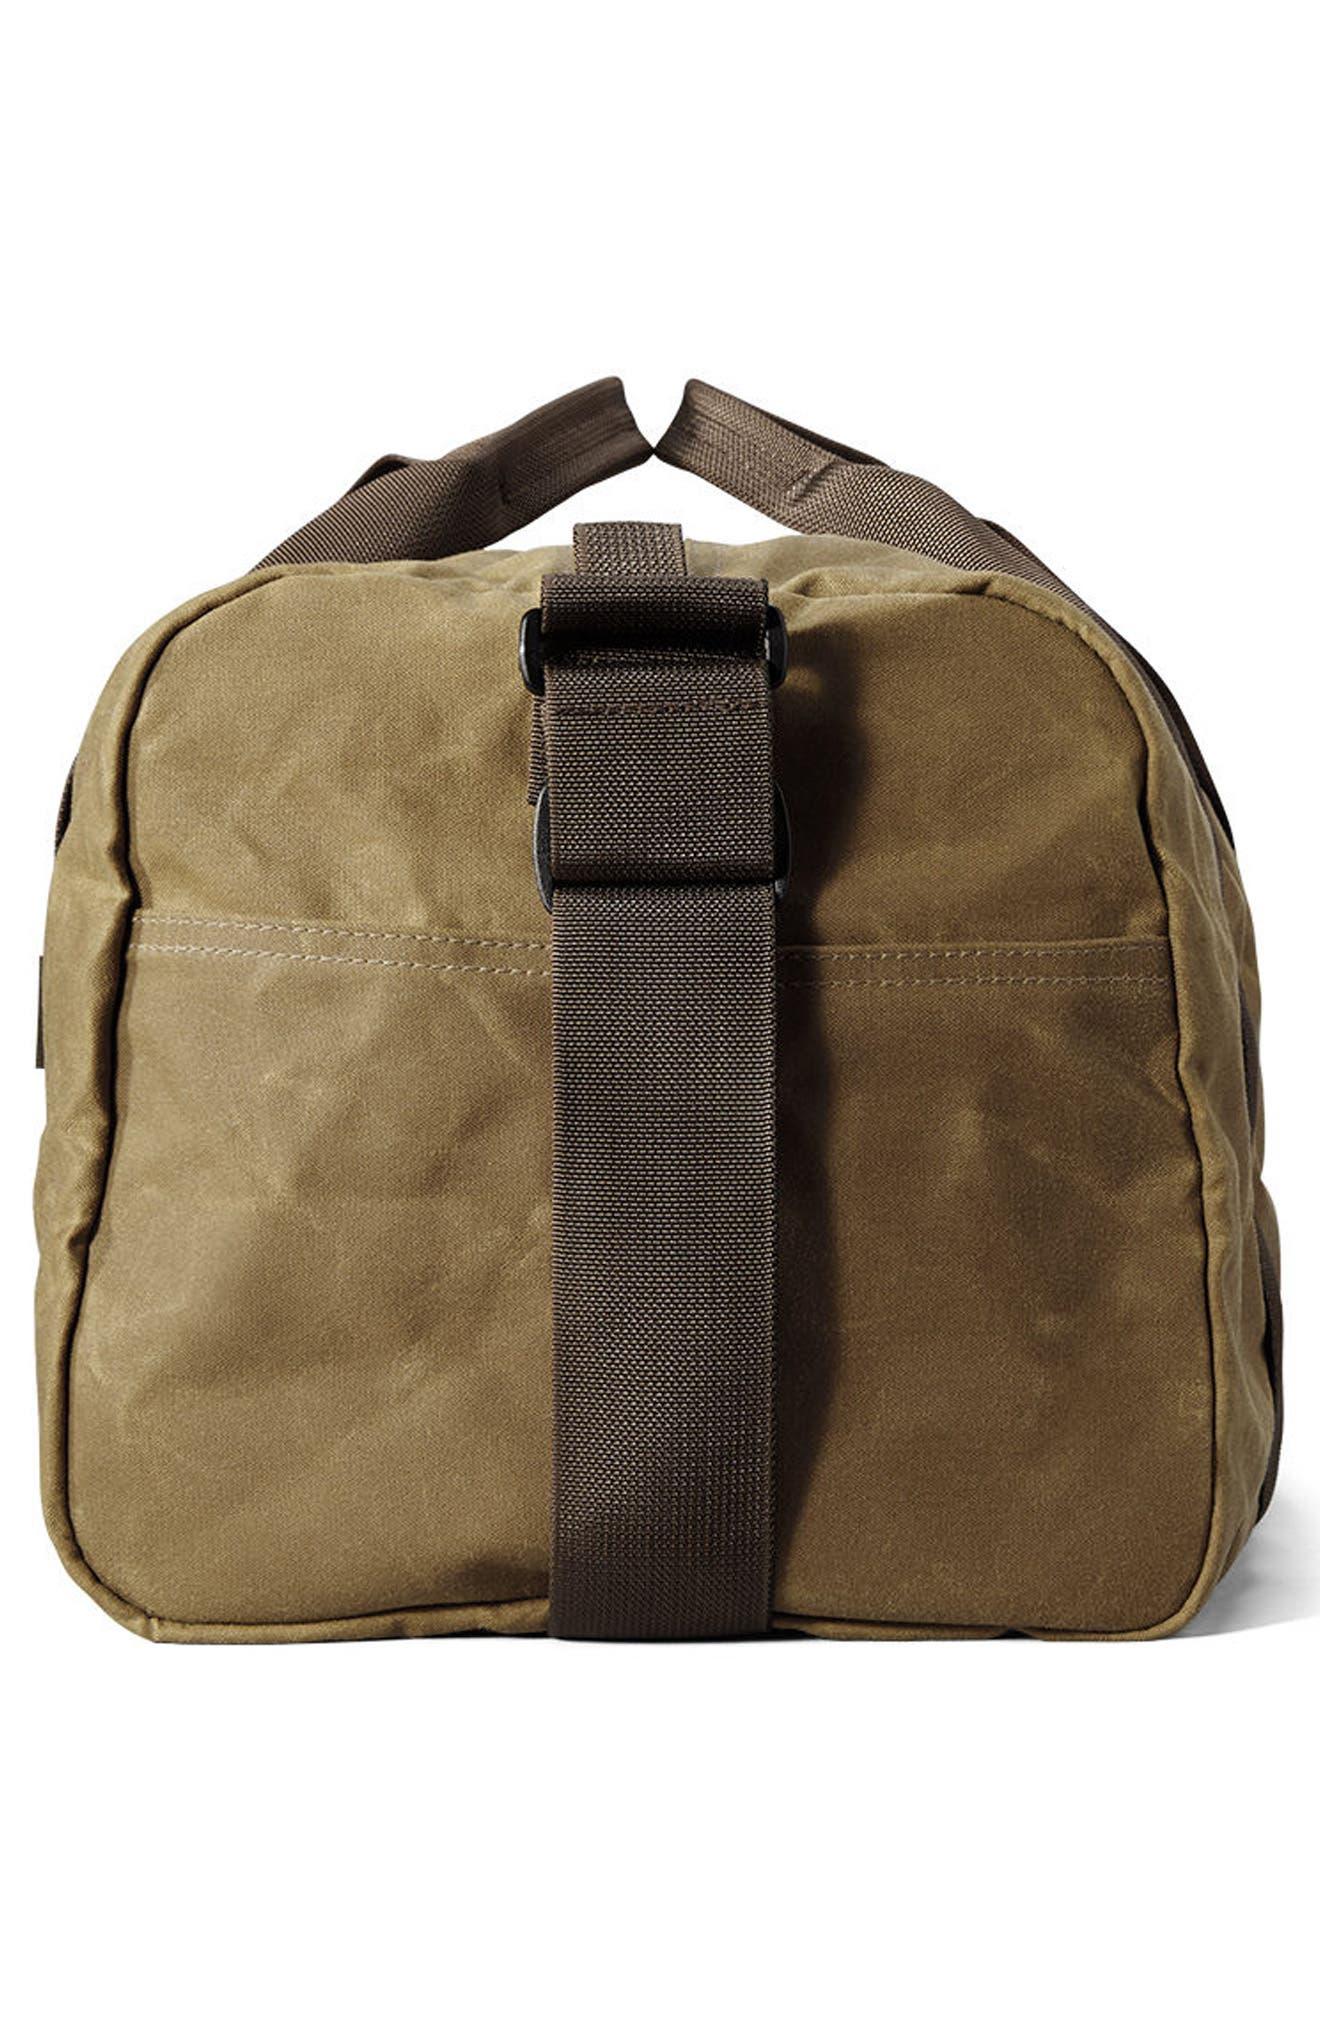 FILSON, Small Field Duffle Bag, Alternate thumbnail 3, color, DARK TAN/ BROWN